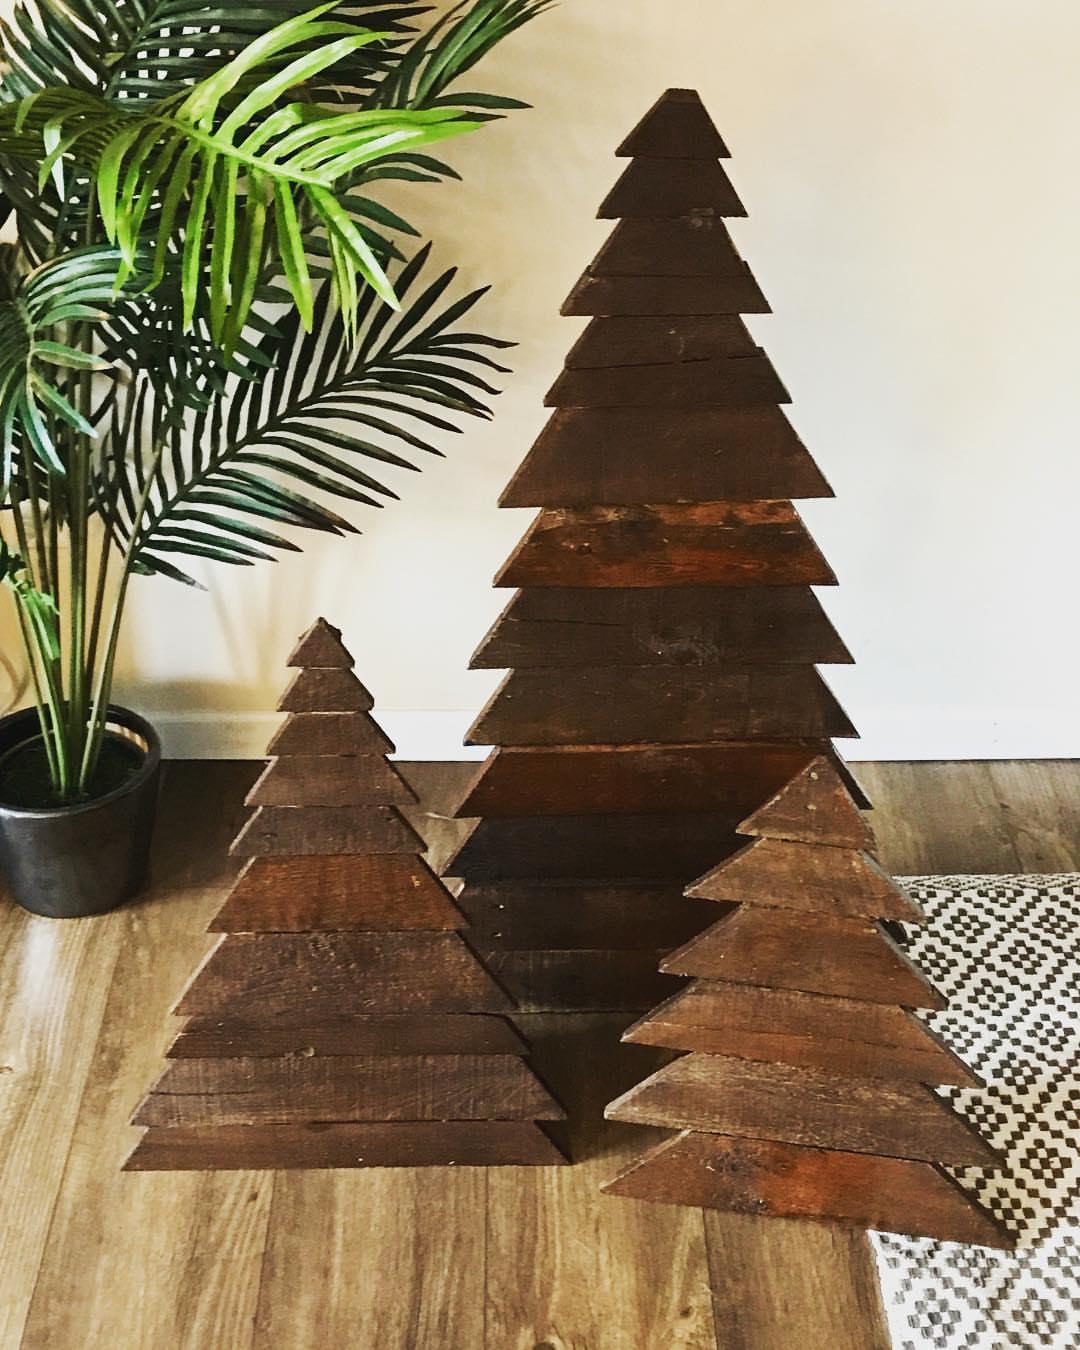 Are Alternative Christmas Trees Trendy?